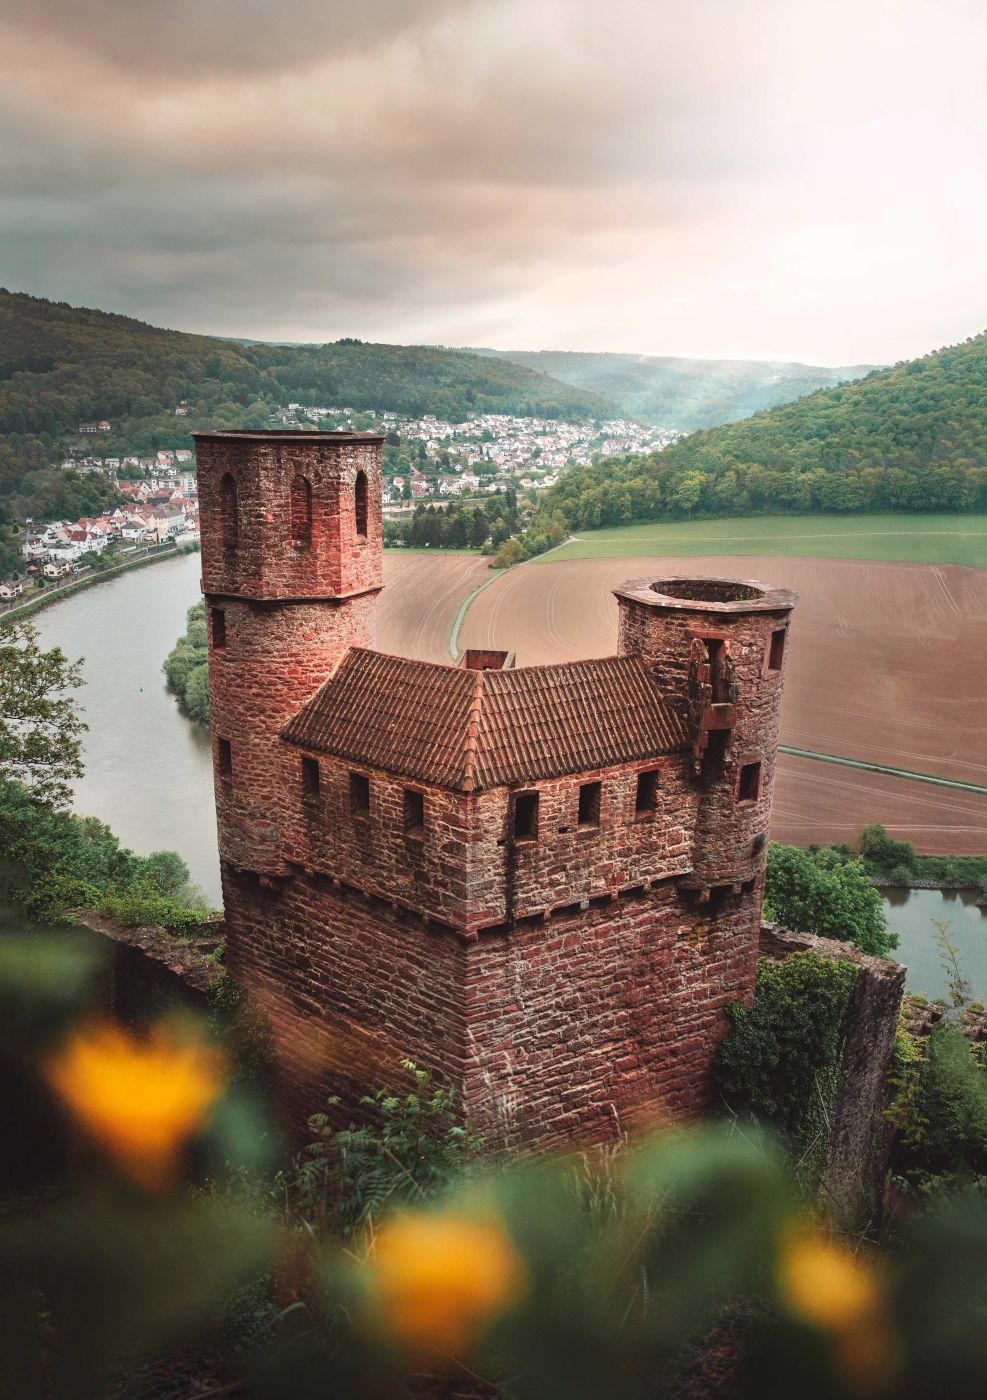 Castle Schadeck, Germany